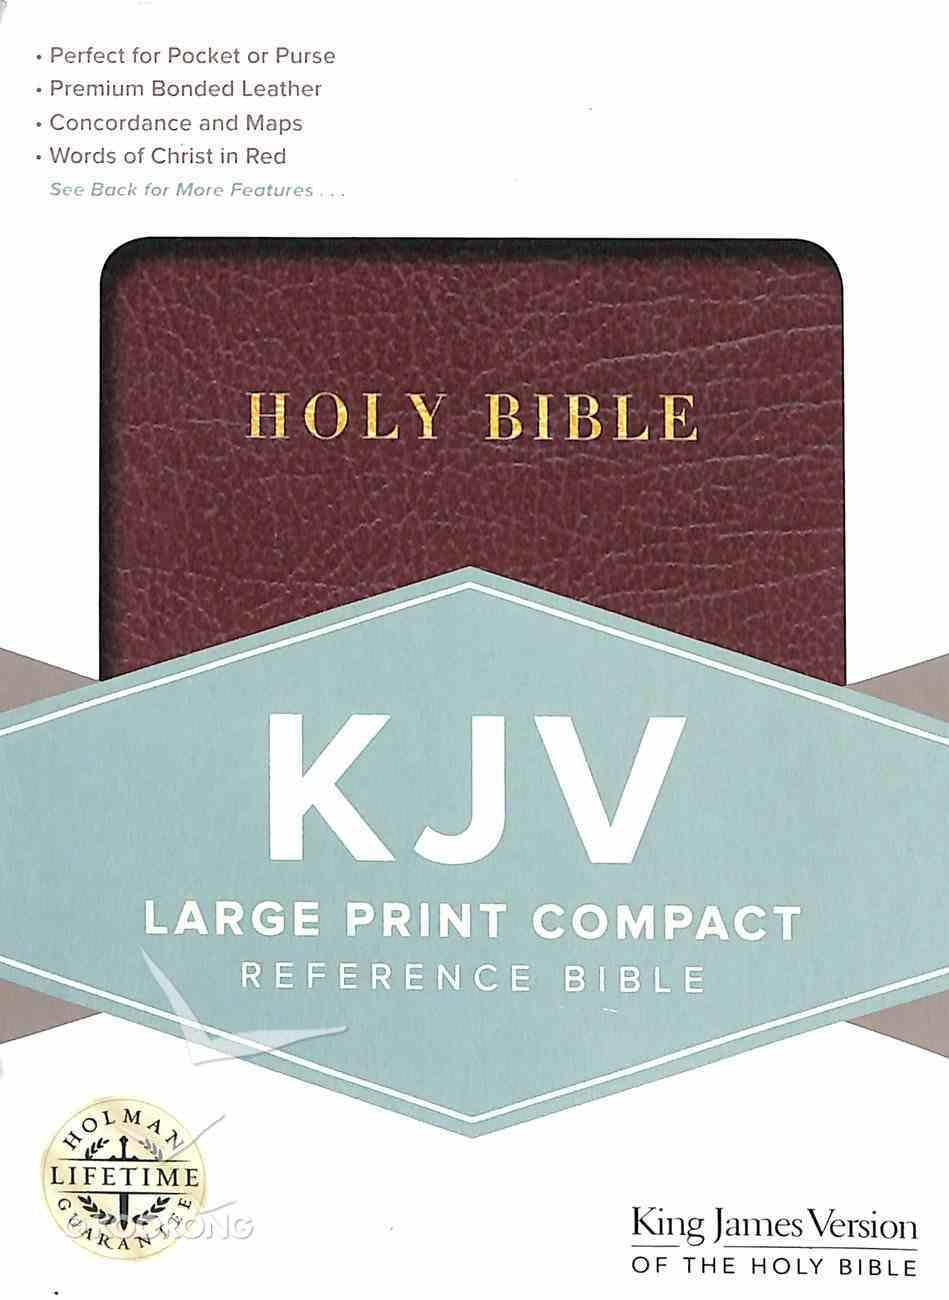 KJV Large Print Compact Reference Bible Burgundy Bonded Leather